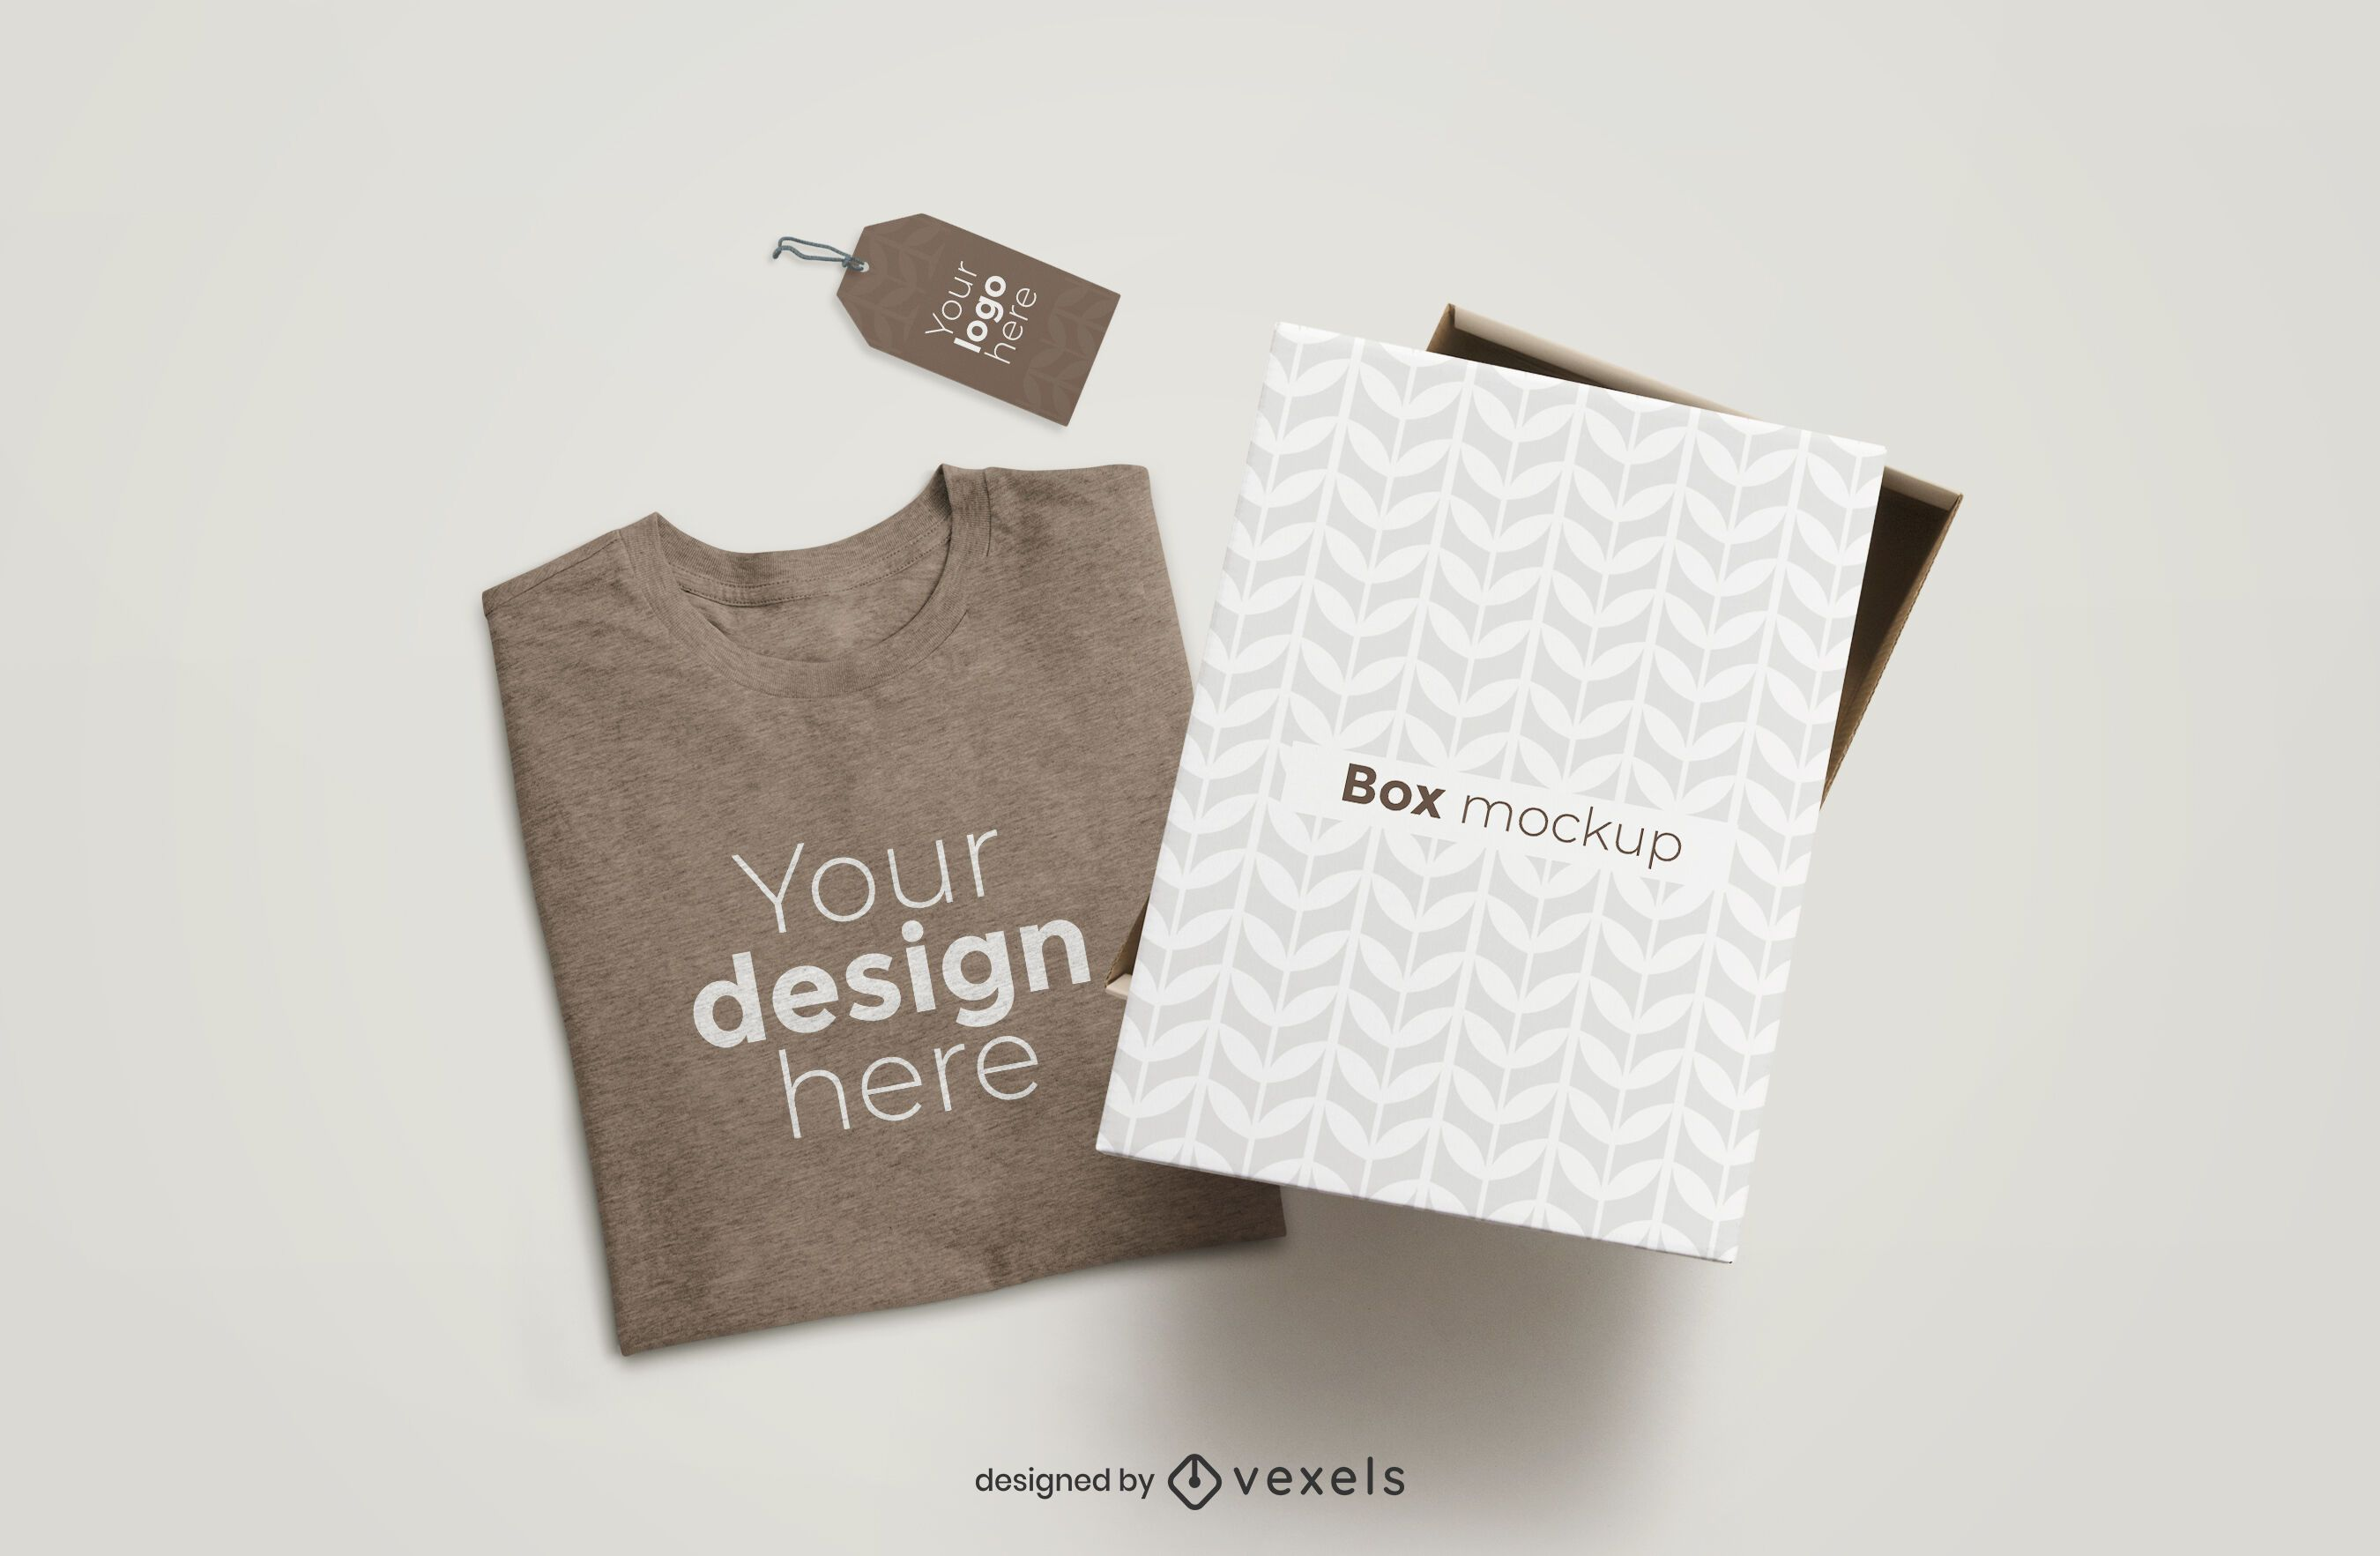 T-shirt box and tag mockup composition